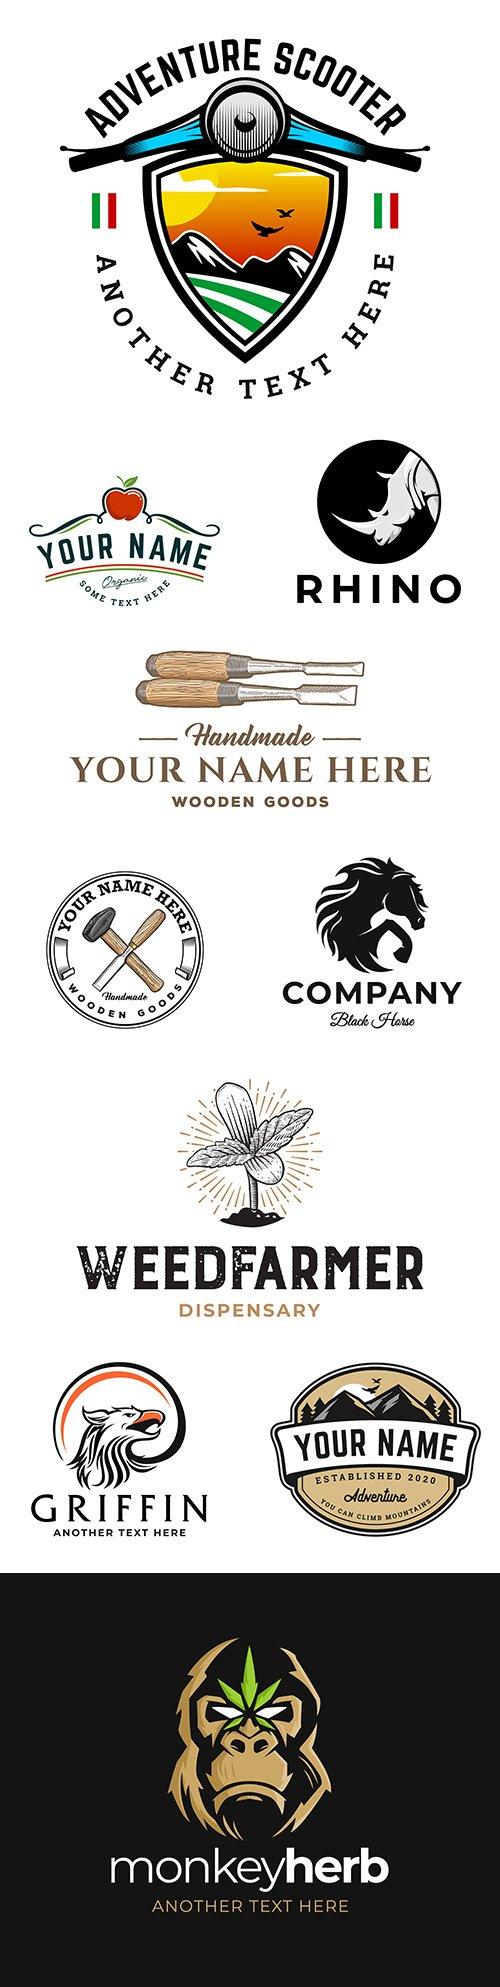 Brand name company logos business corporate design 15